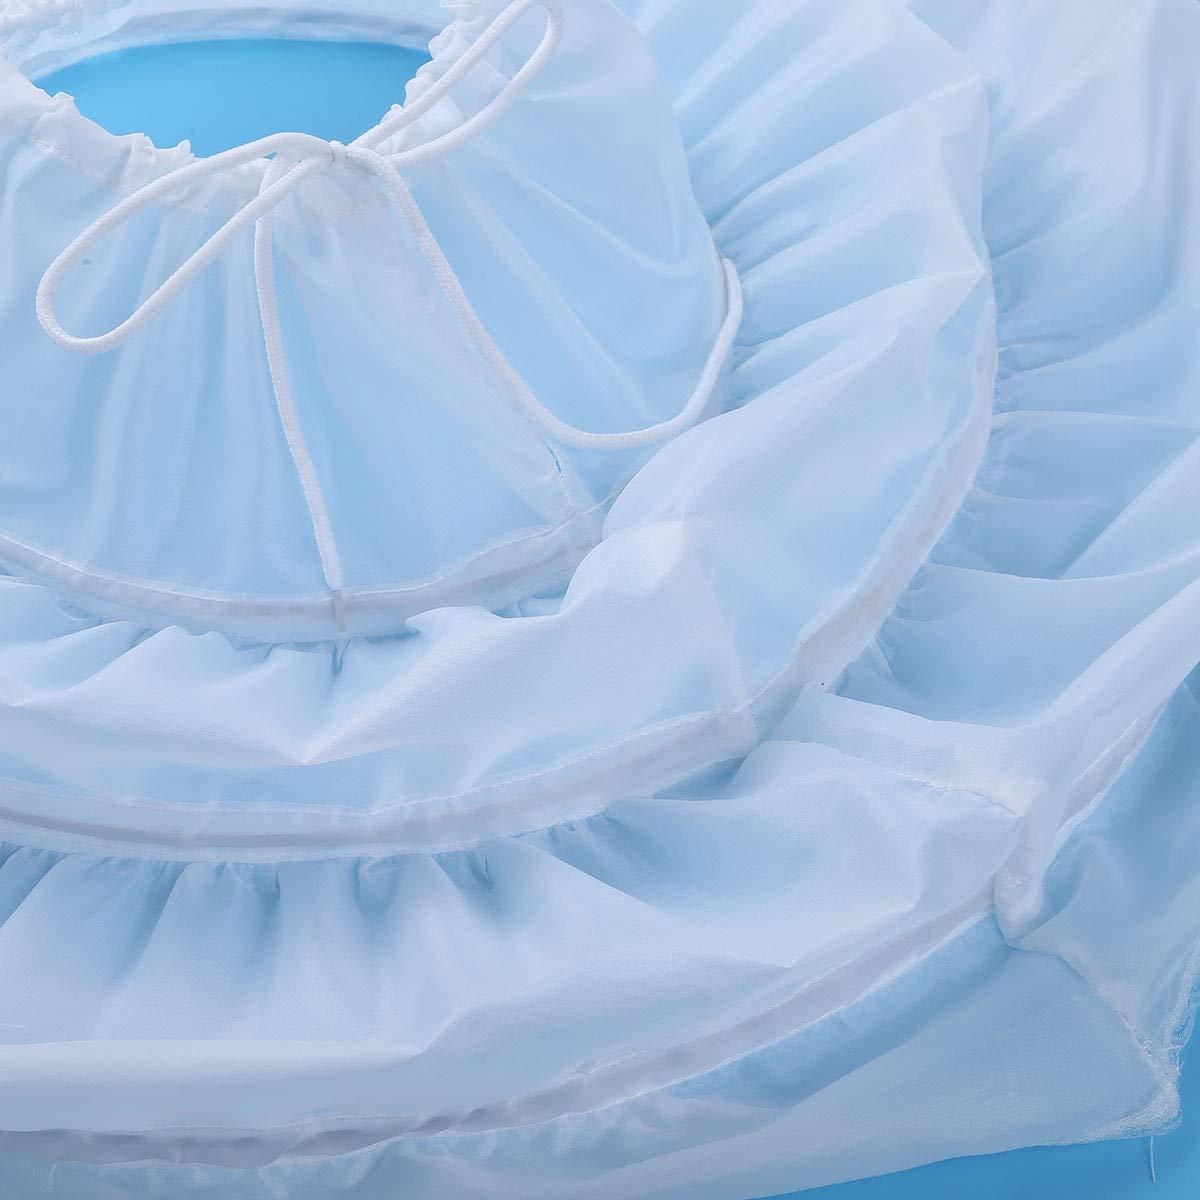 Freebily Kids Flower Girls Crinoline Petticoat 2 Hoops Net Wedding Bridesmaid Drawstring Underskirt Slip